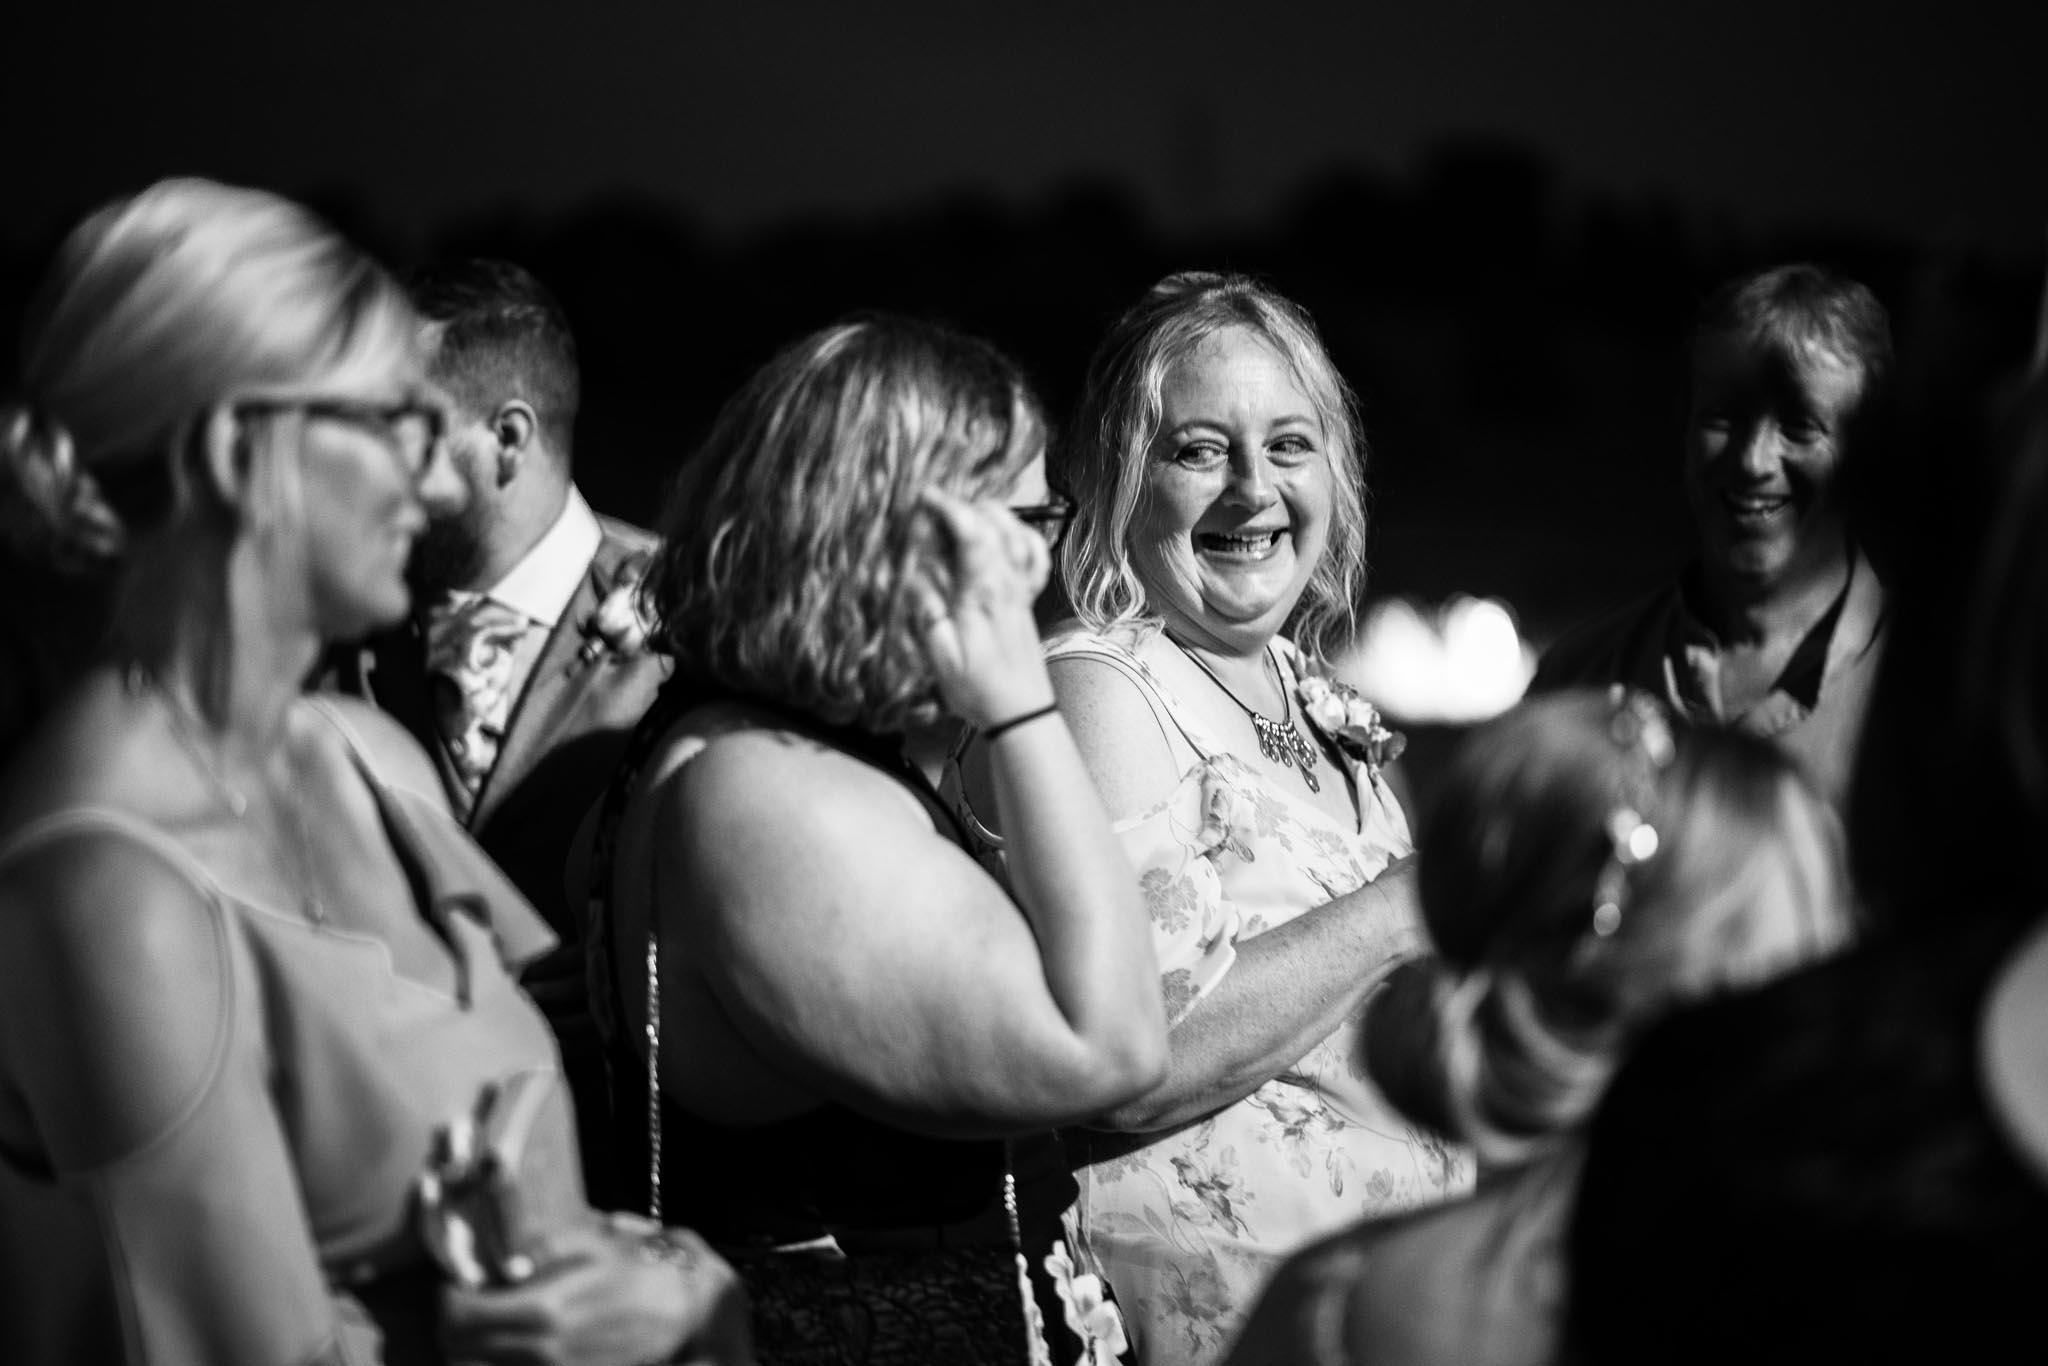 1023-Night-Reception-Luke-Yasmin-The-Rayleigh-Club-Wedding-Photography.jpg